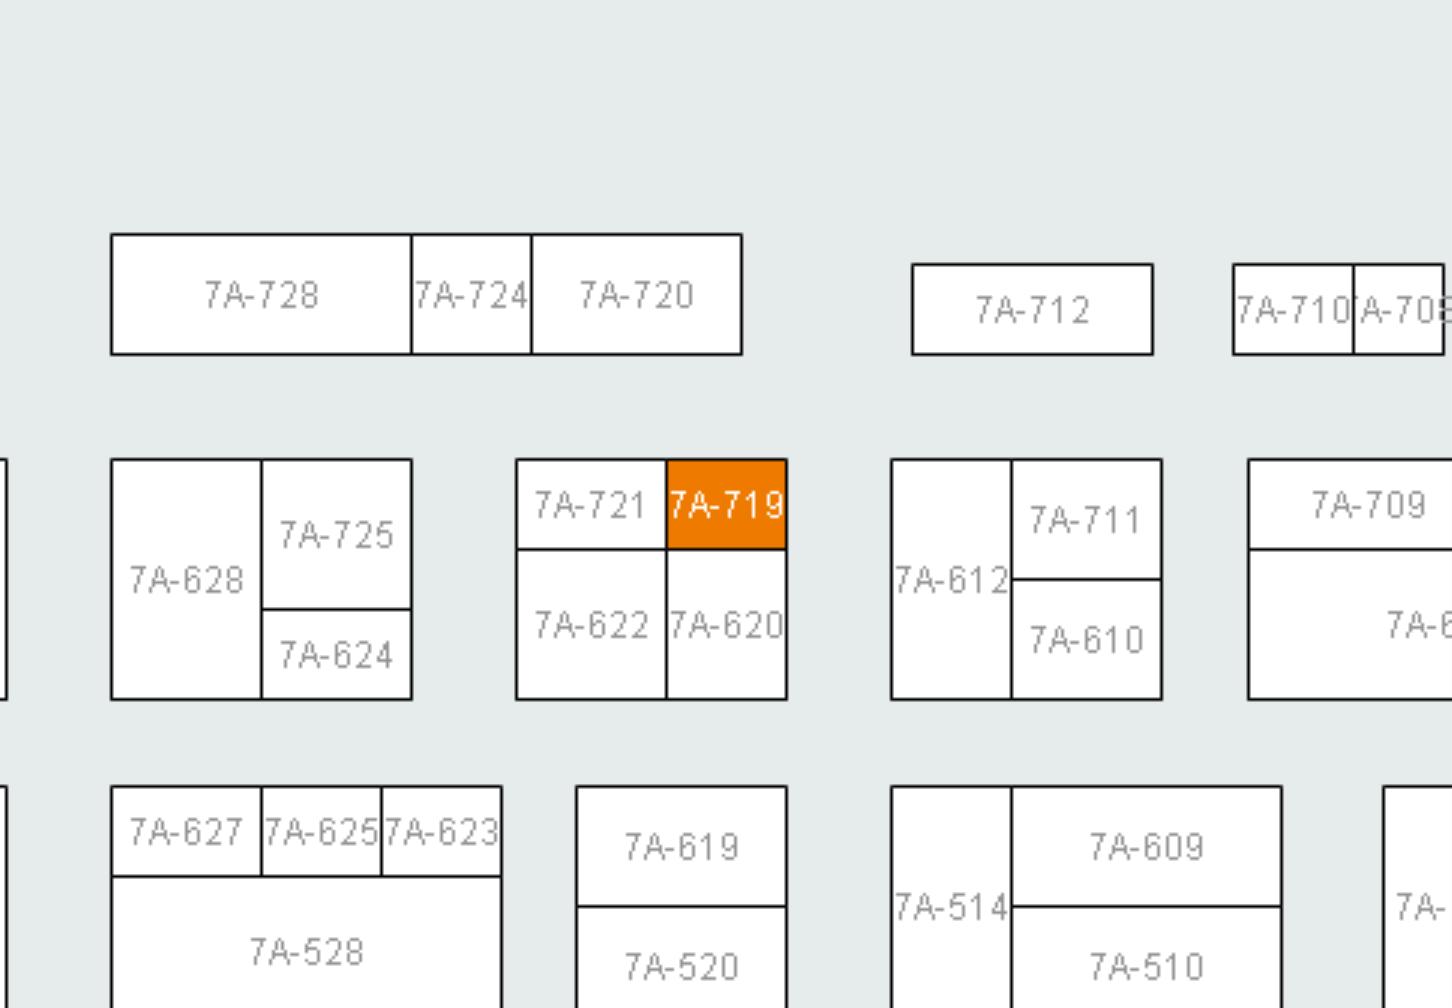 7A / 7A-719